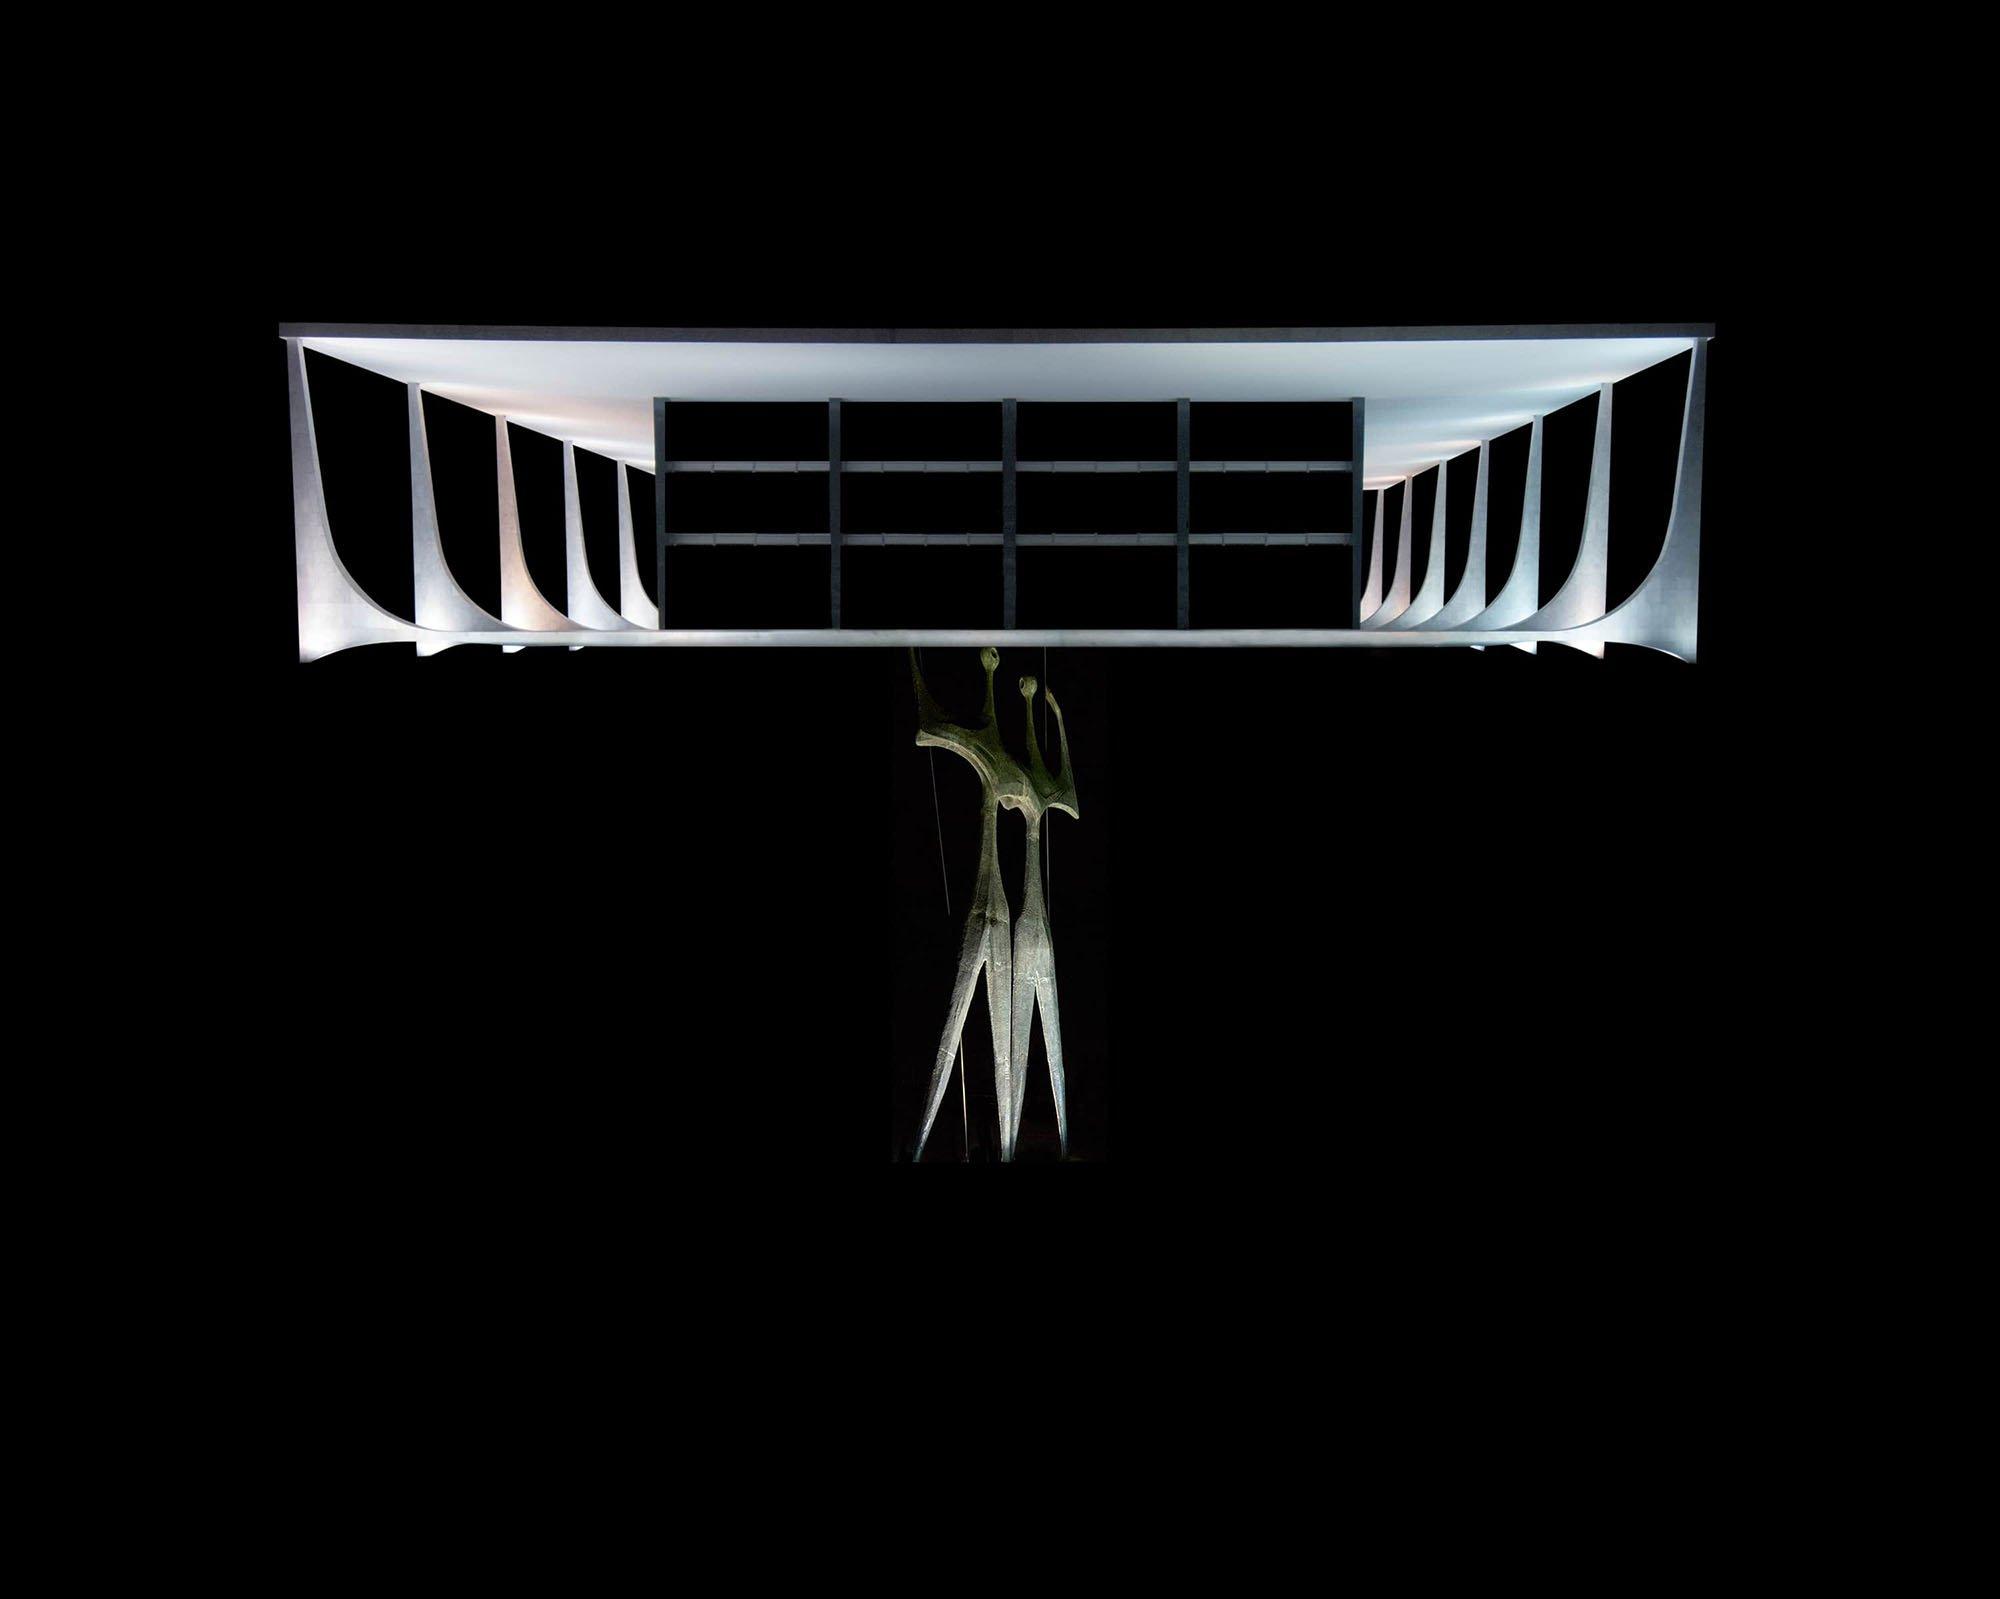 © Leonardo Costa Braga, Brazil, Shortlist, Professional competition, Architecture and Design, Sony World Photography Awards 2021_05